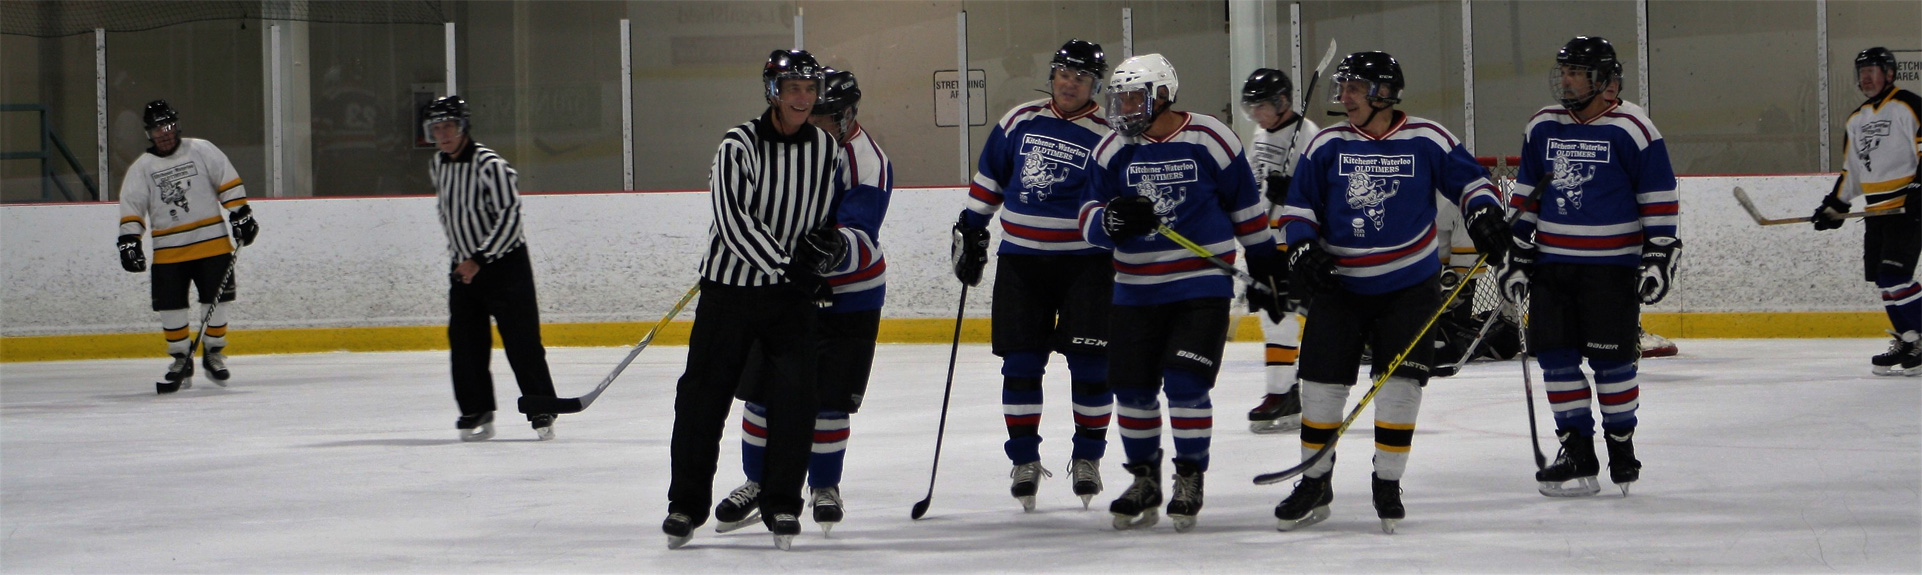 K-W Oldtimers' Hockey Club